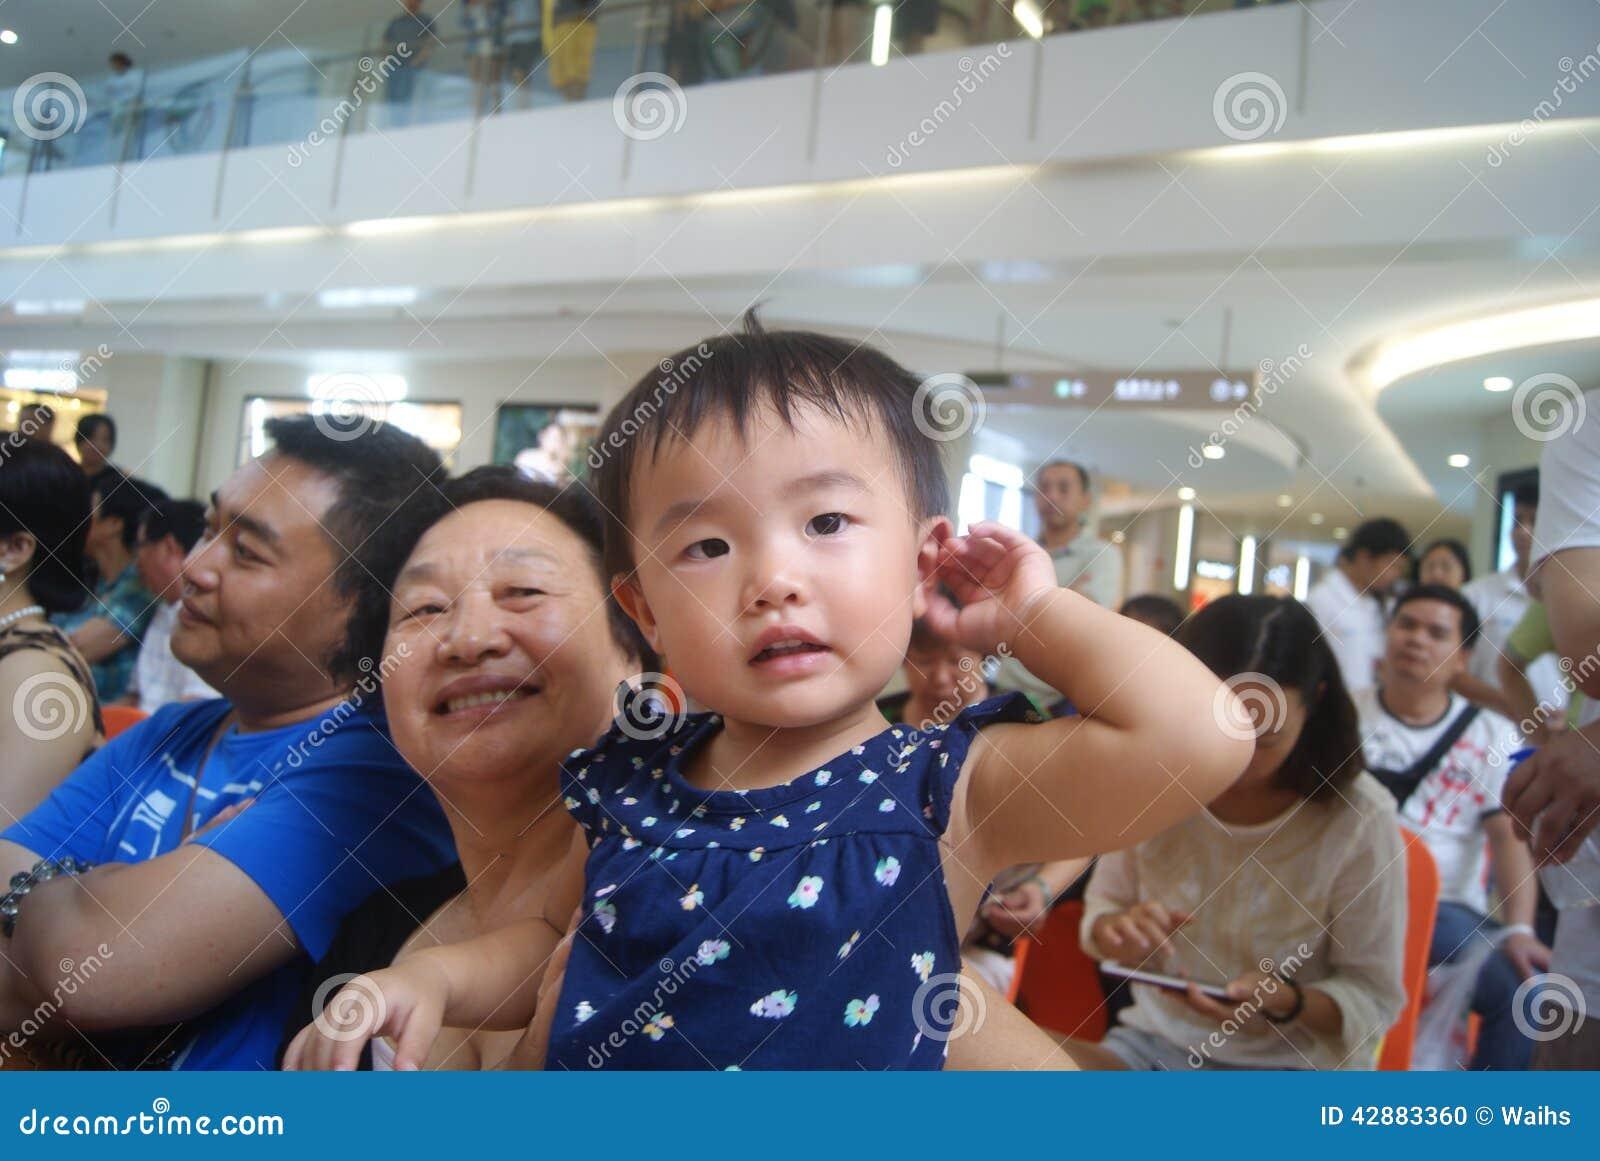 Shenzhen, Κίνα: Το ταλέντο των παιδιών παρουσιάζει δραστηριότητες επί τόπου